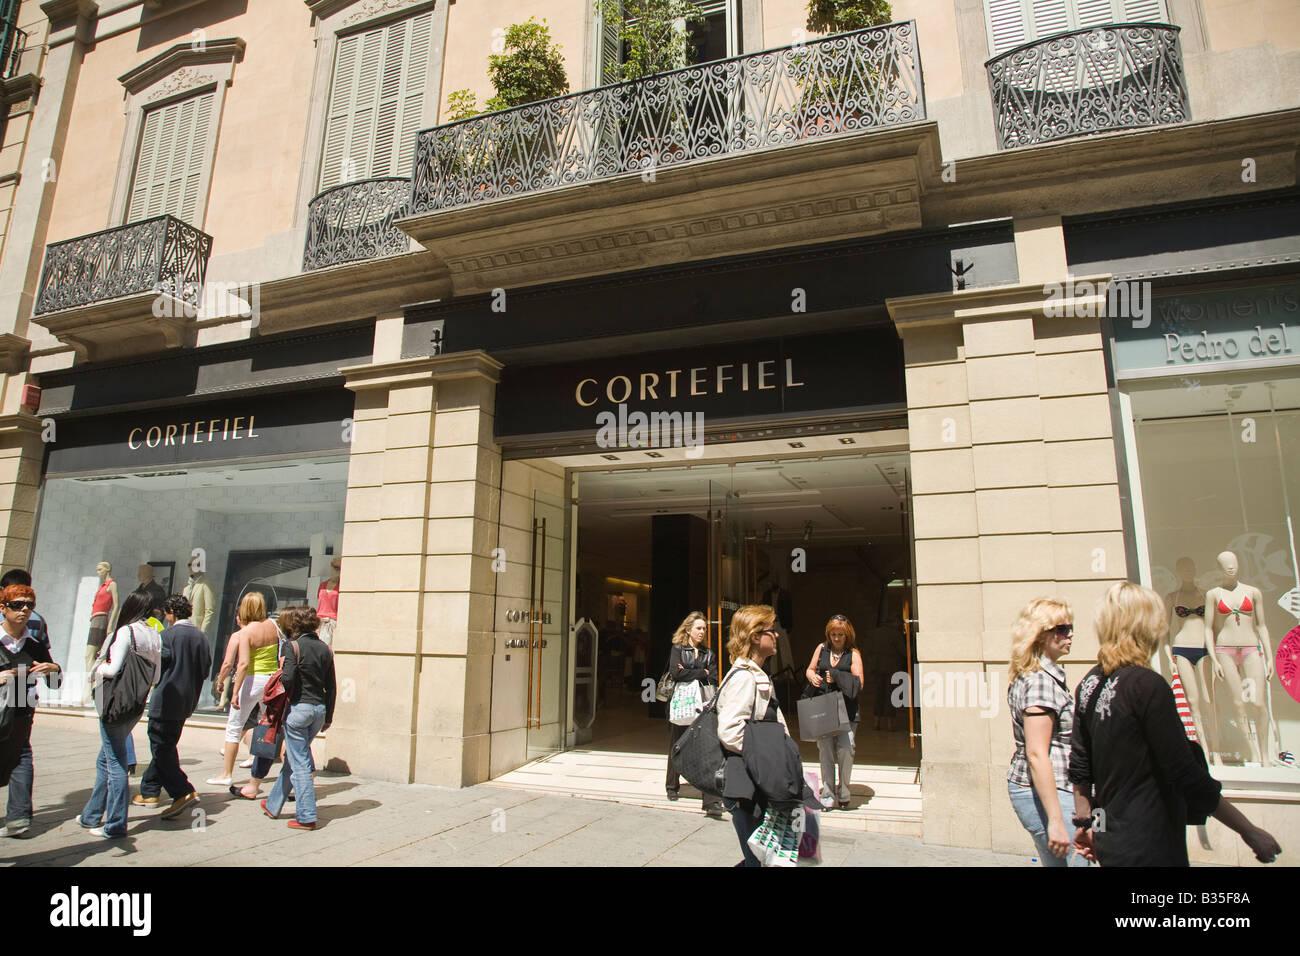 SPAIN Barcelona Cortefiel retail store on Passeig de Gracia street high end shopping district pedestrians by entrance Stock Photo